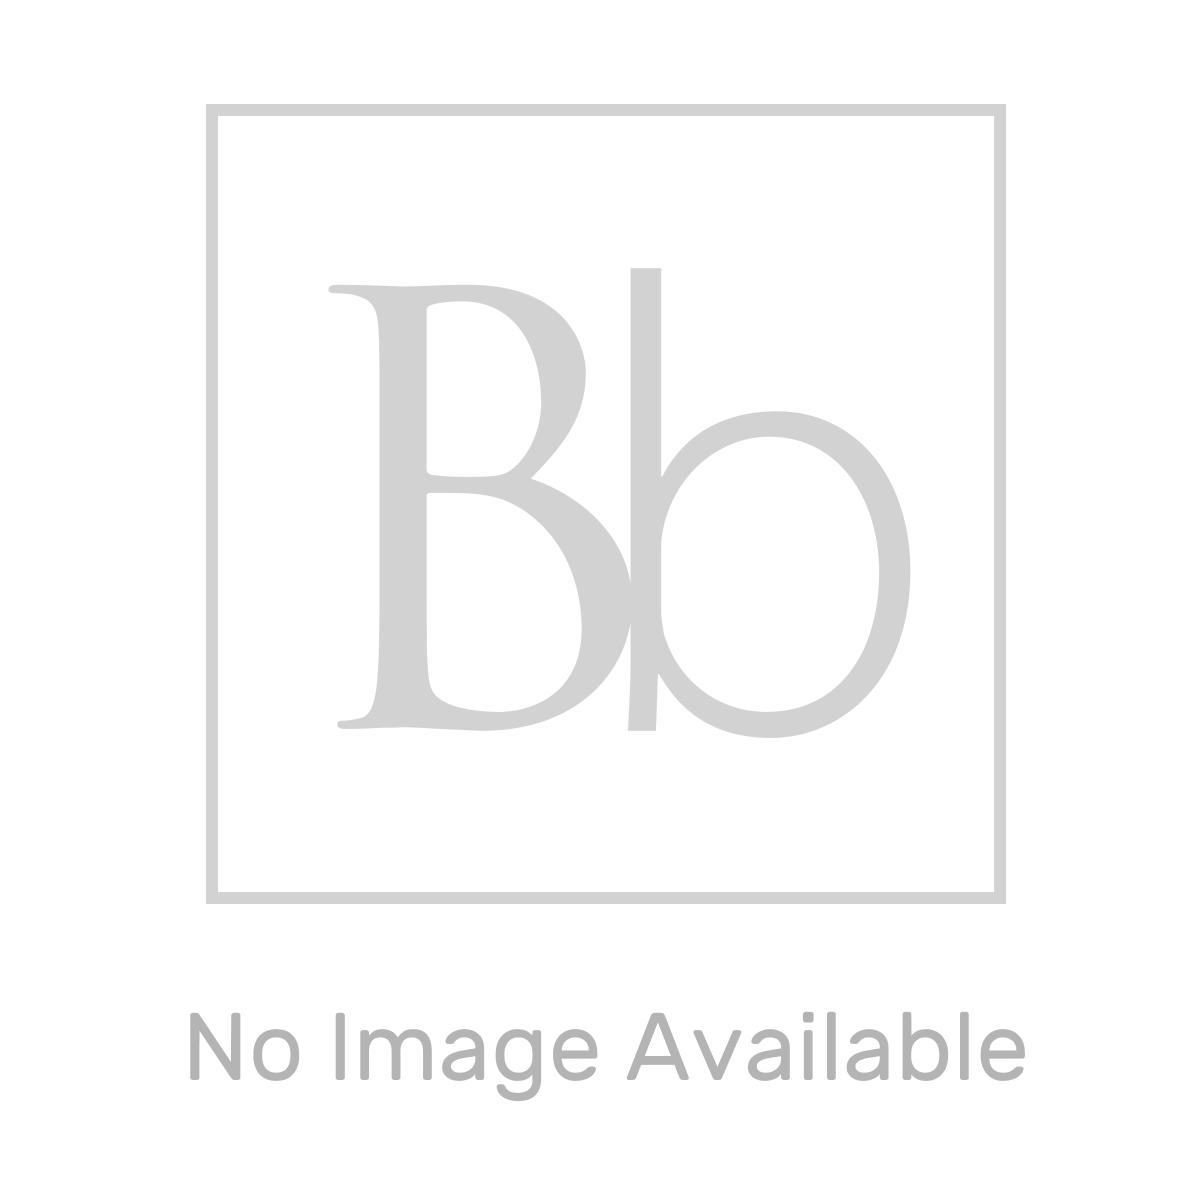 Nuie Athena Hacienda Black 2 Drawer Floor Standing Vanity Unit with 50mm Profile Basin 600mm Line Drawing